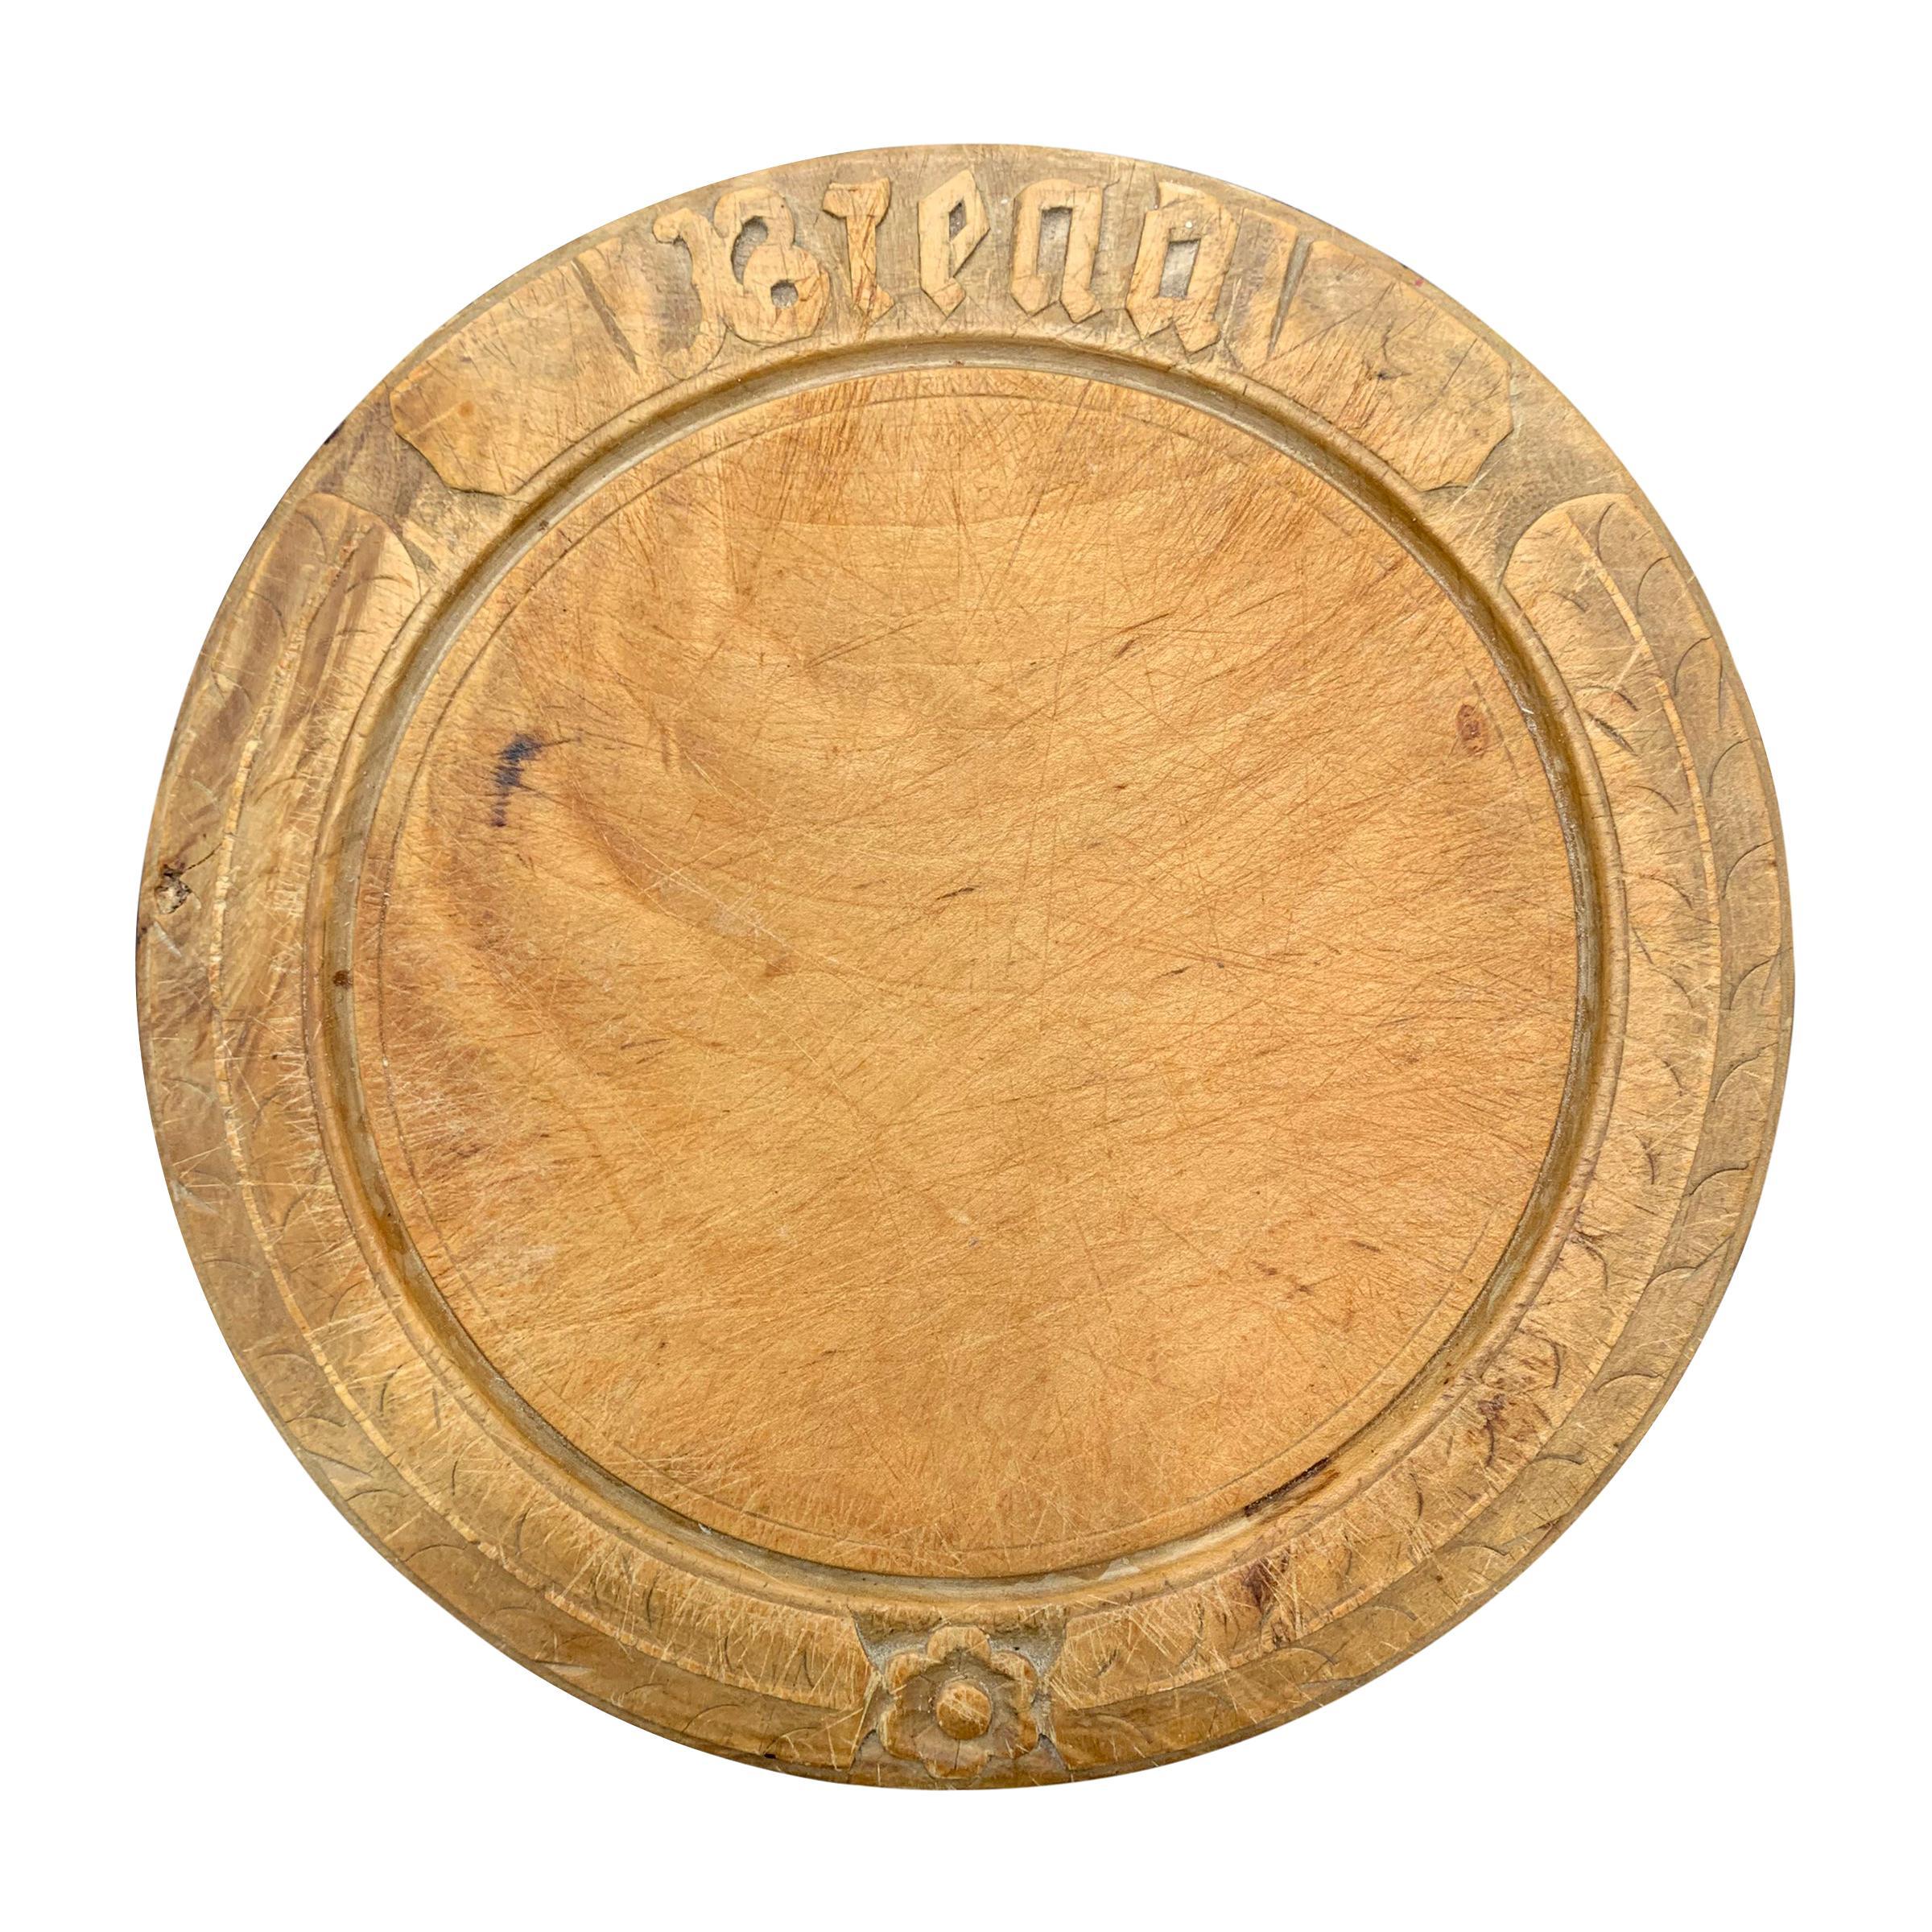 Early 20th Century American Breadboard